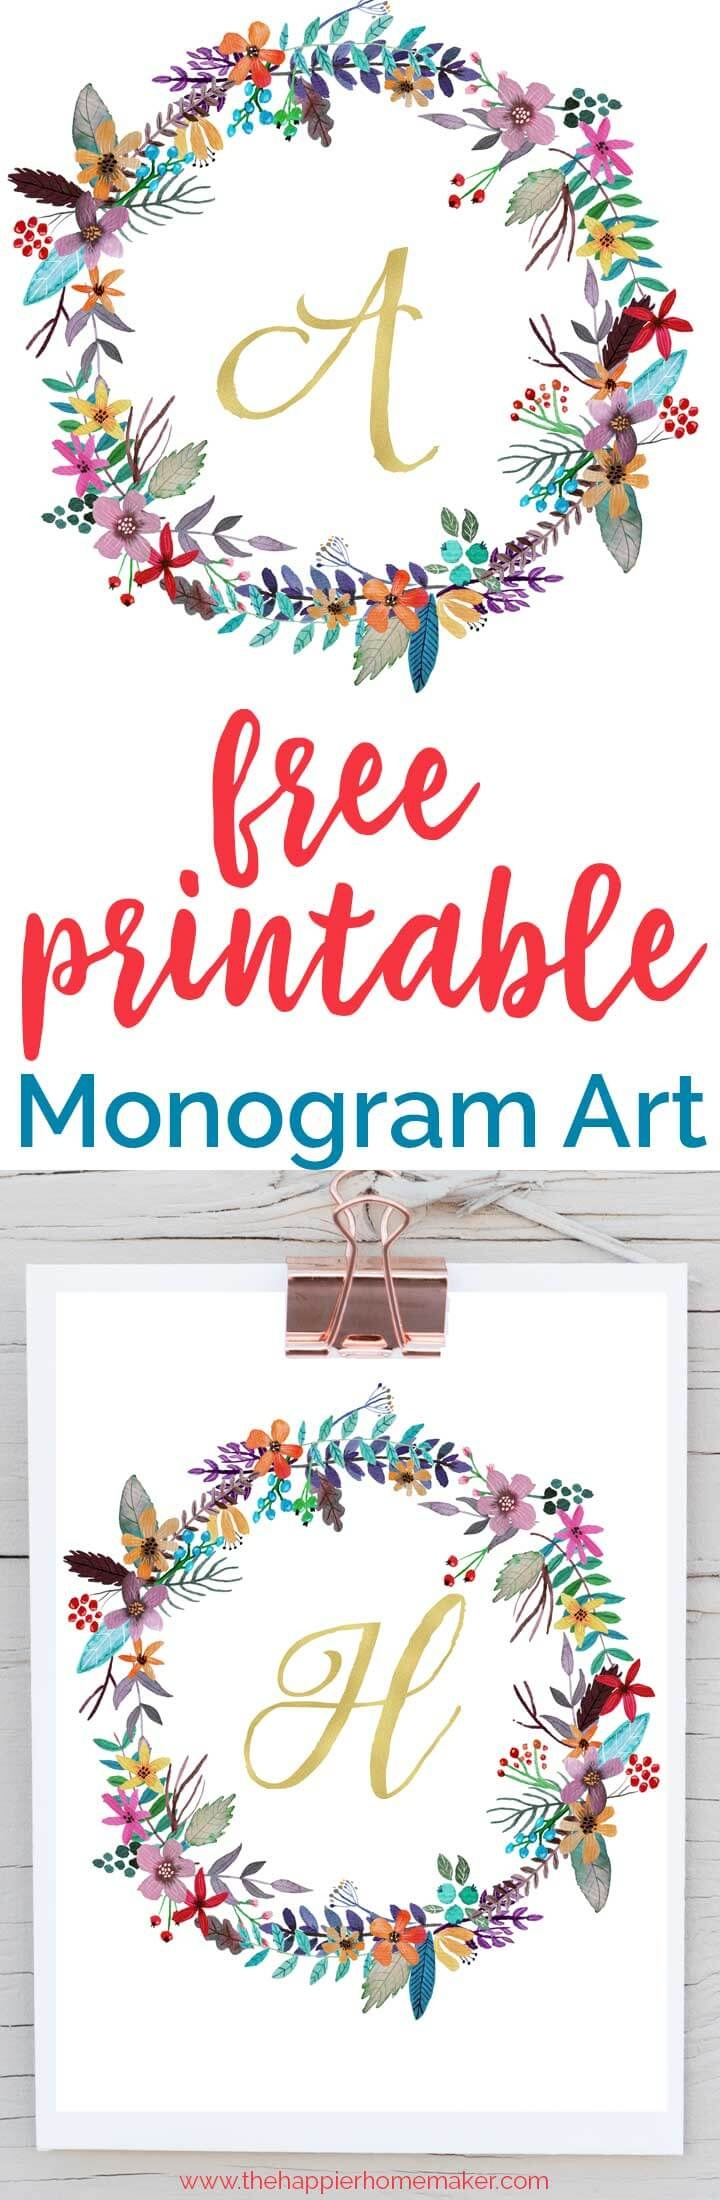 Free Printable Monogram Art   The Happier Homemaker - Free Printable Monogram Letters